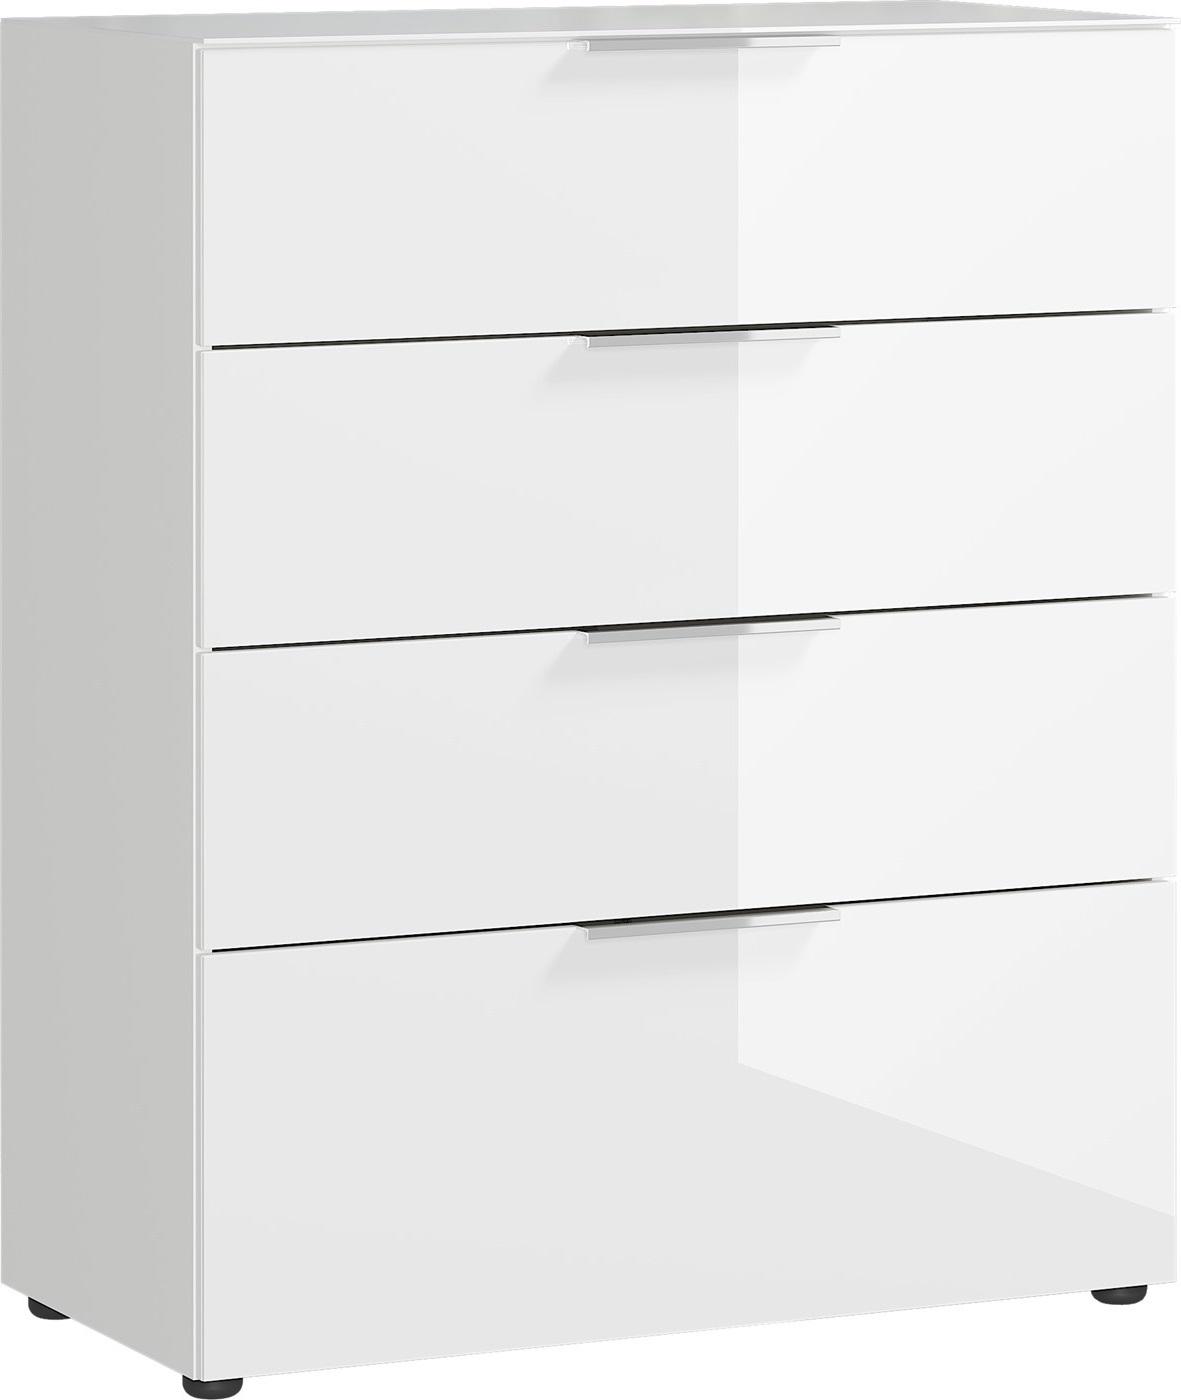 Ladekast Oakland 102 cm hoog in wit